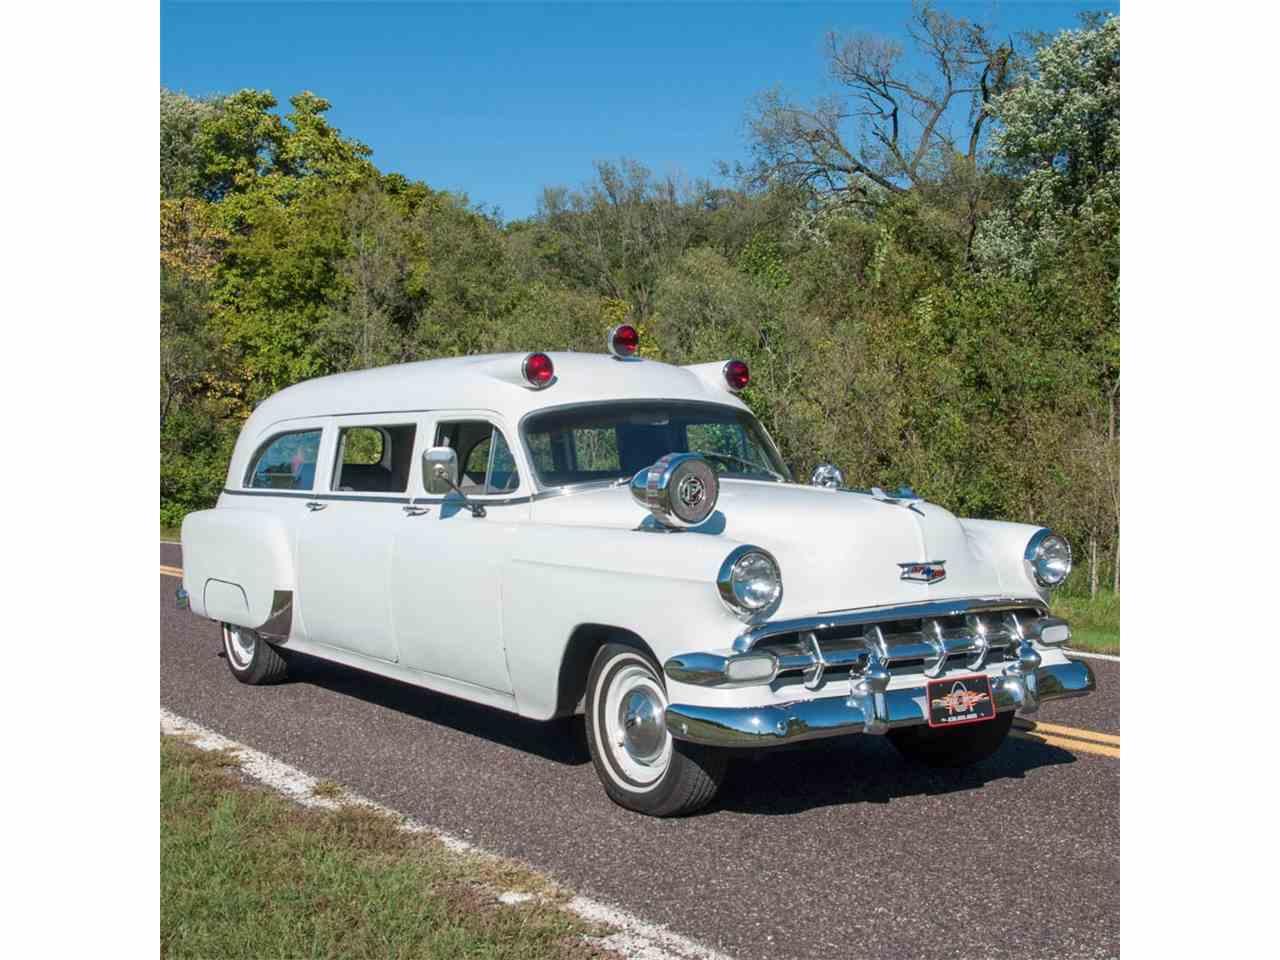 1954 Chevrolet 150 Ambulance for Sale | ClassicCars.com | CC-914608